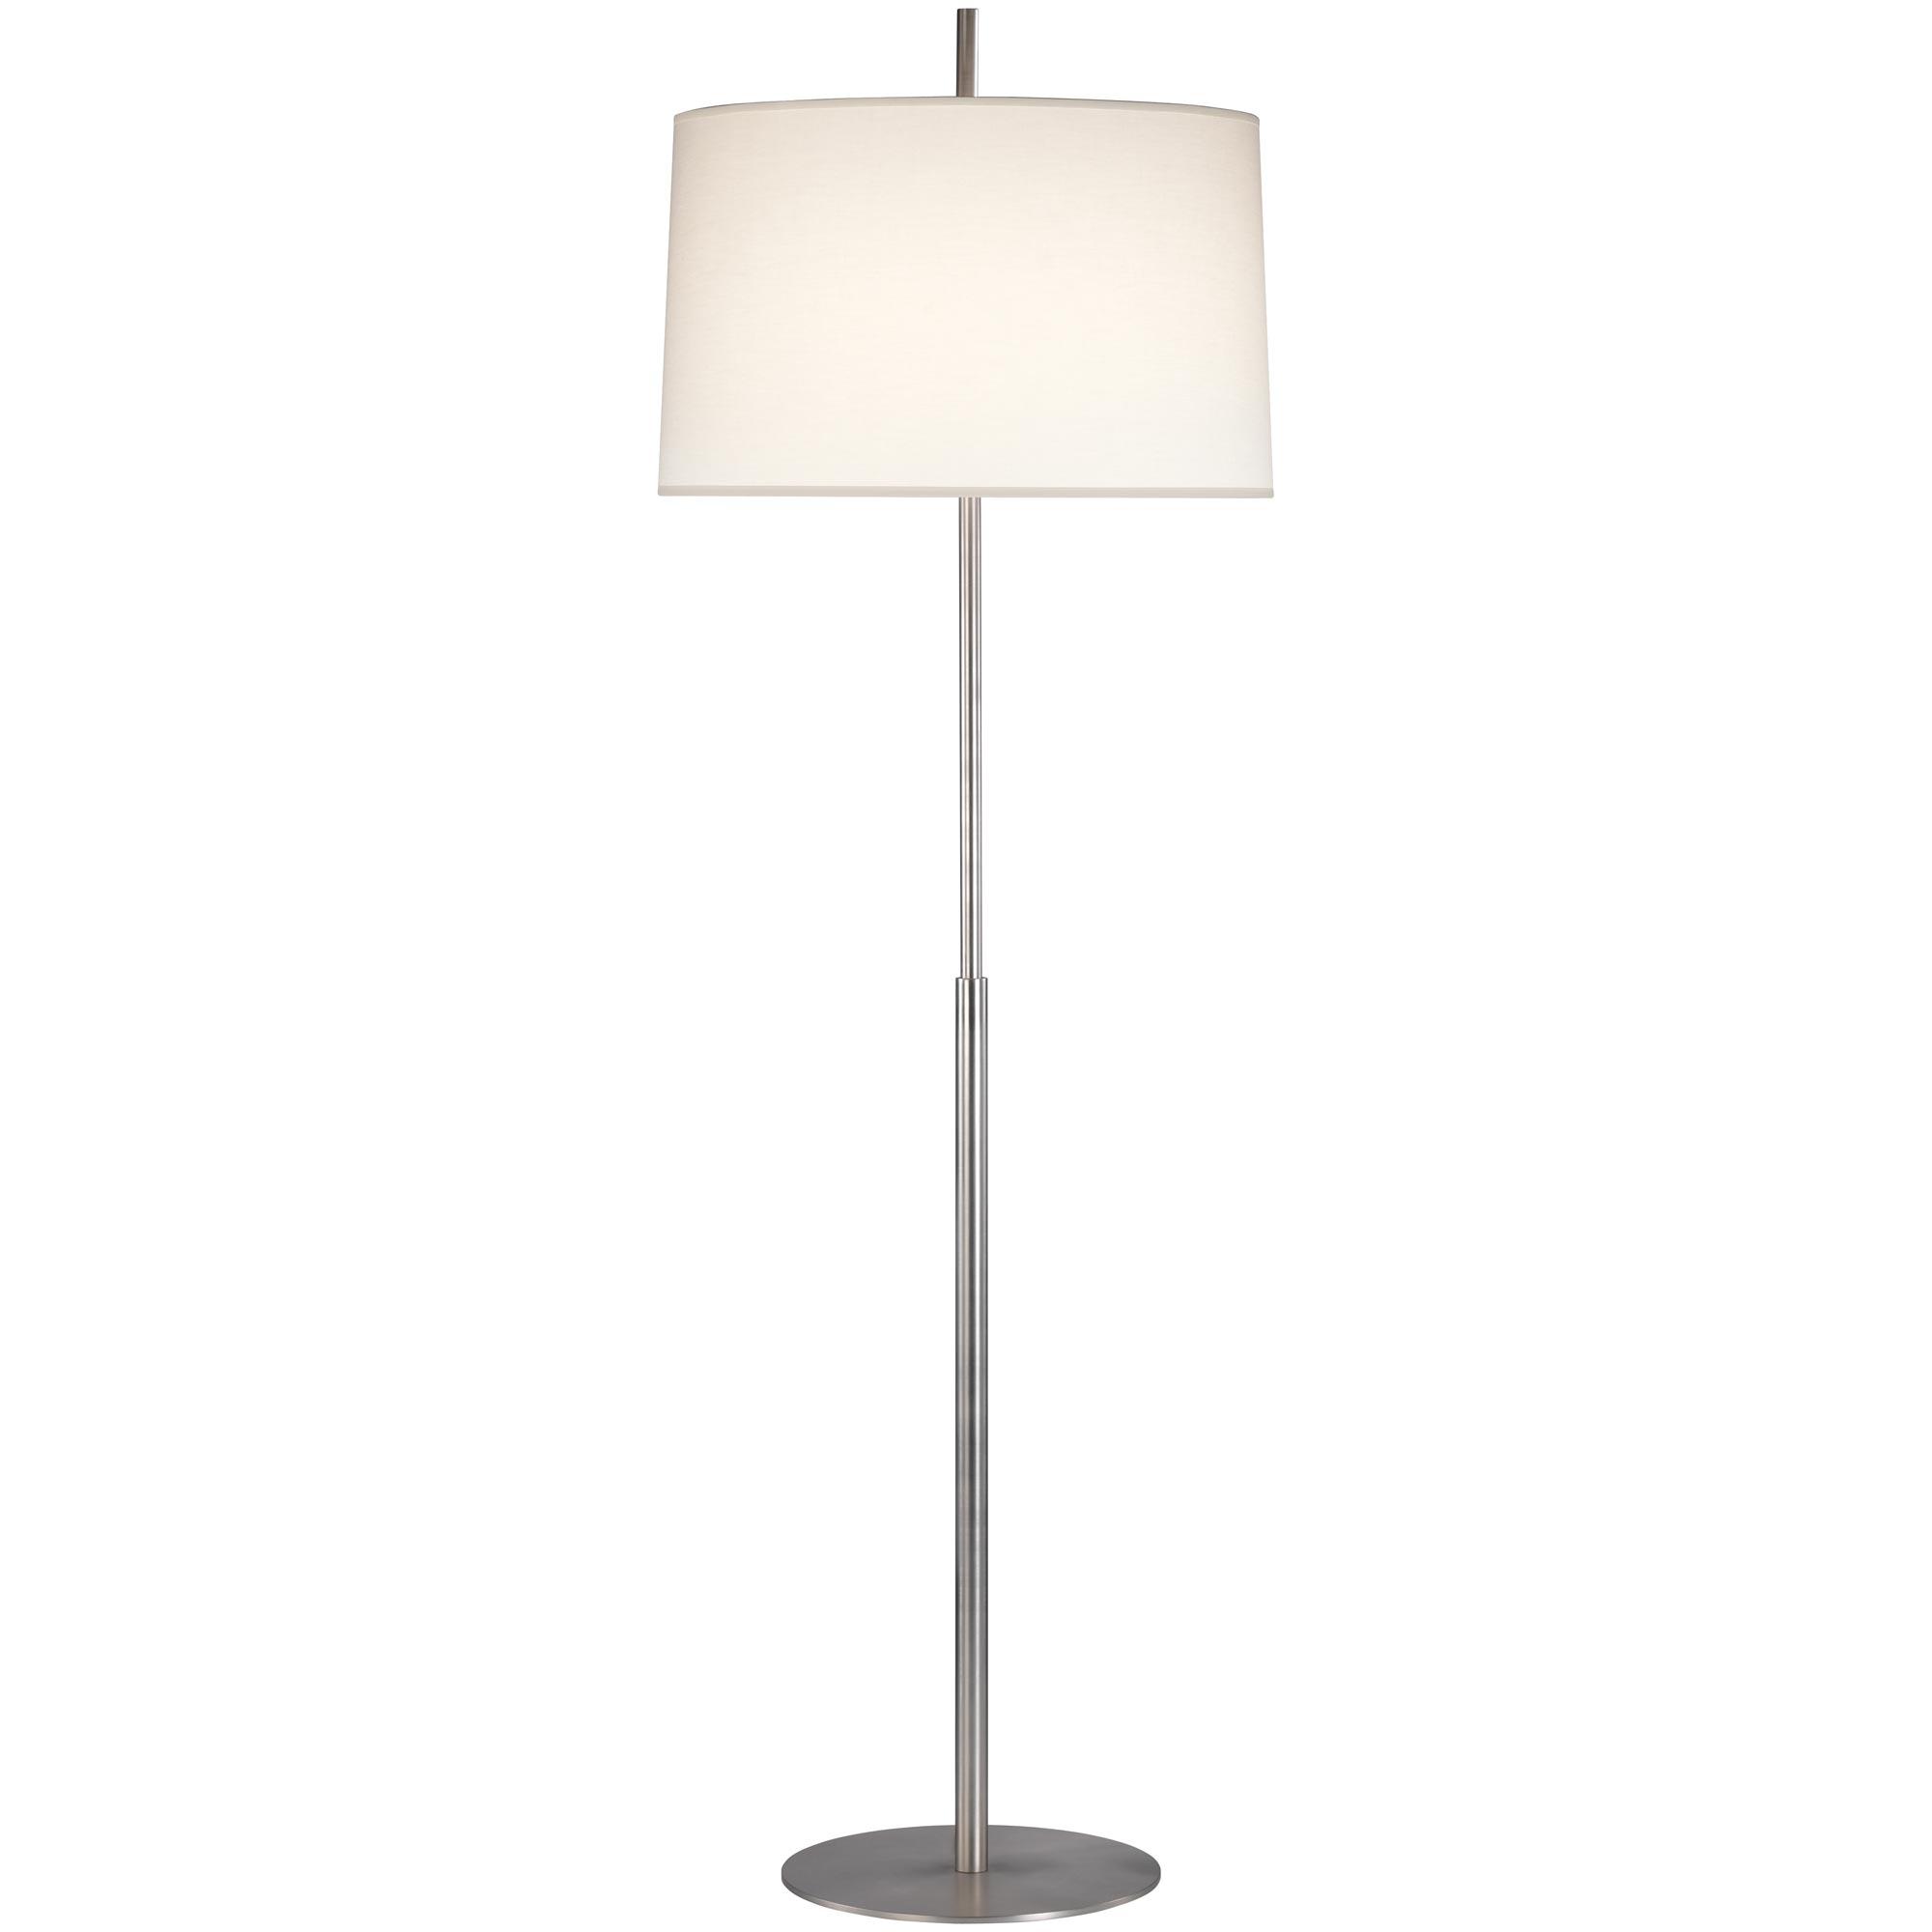 echo floor lamp by robert abbey ras2181 - Robert Abbey